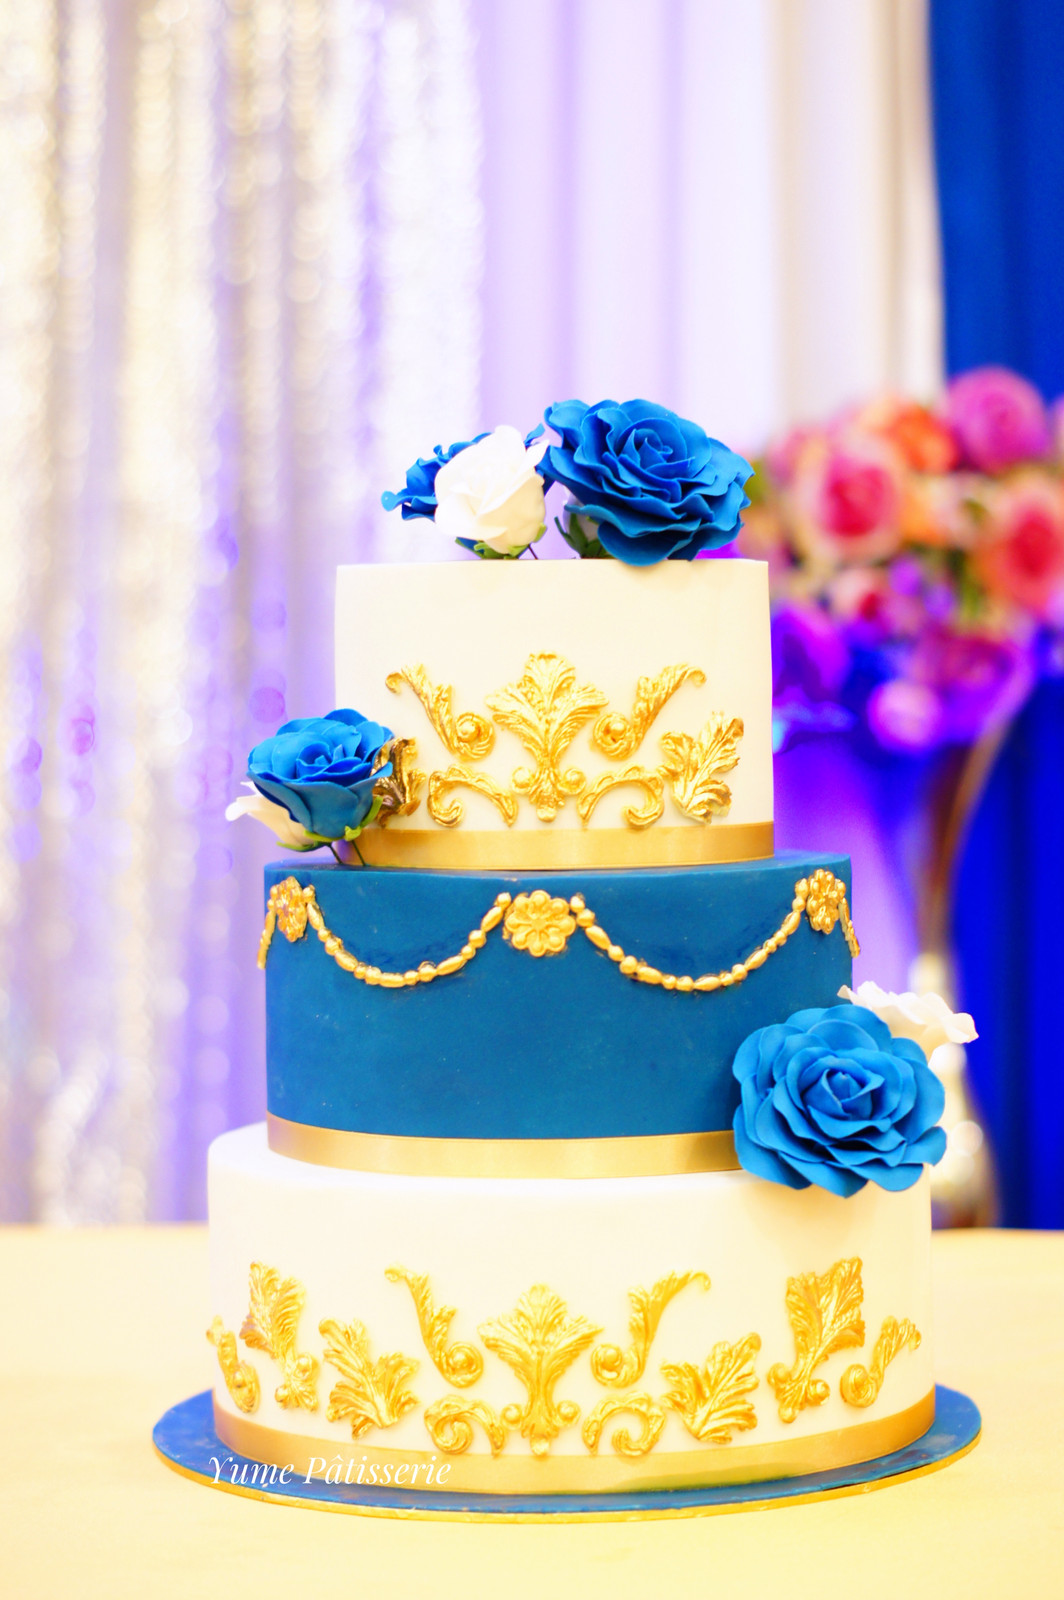 Yume Patisserie Wedding Cake Singapore